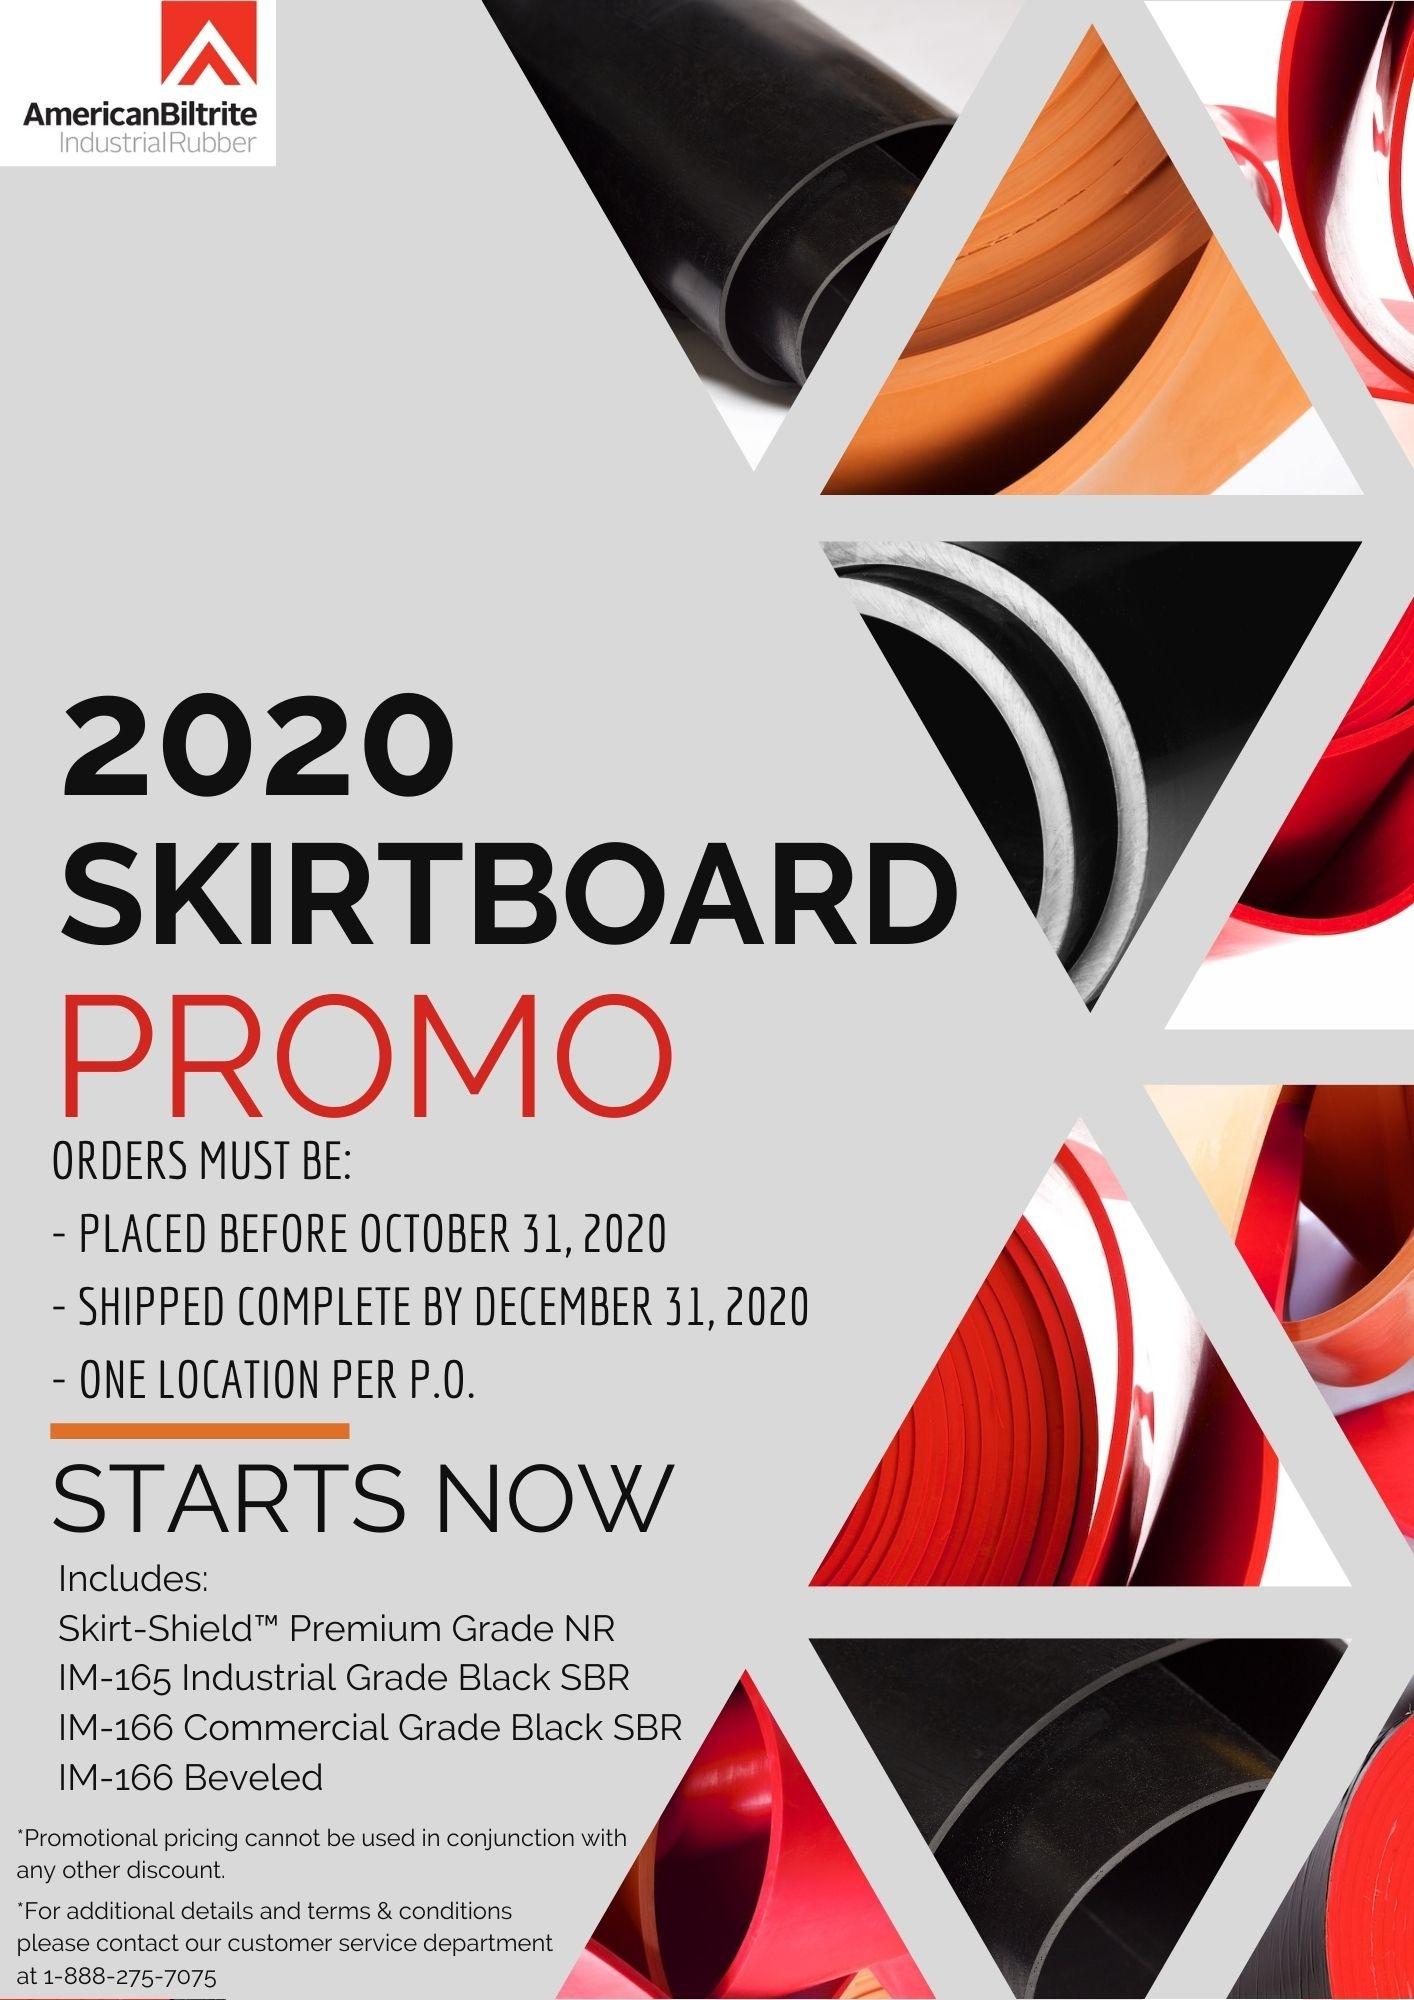 Skirtboard Promo Page 1